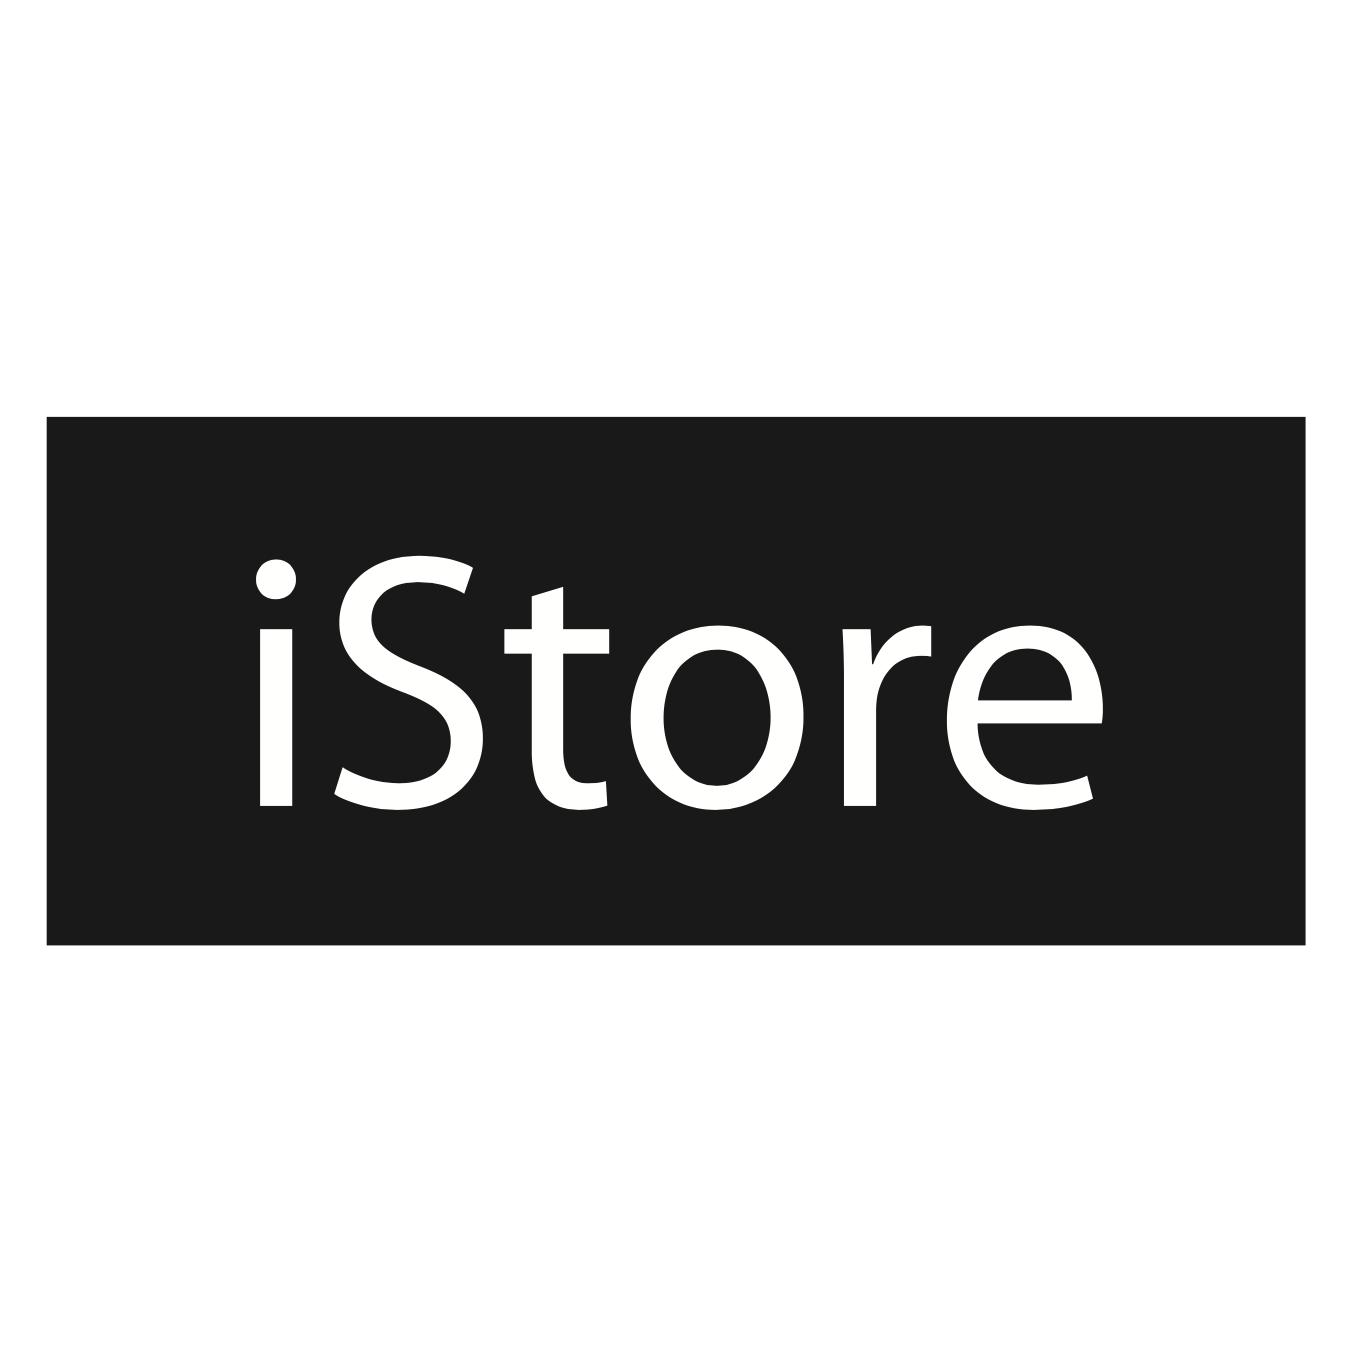 Mac mini 3.0GHz 6-core Intel Core i5 256GB